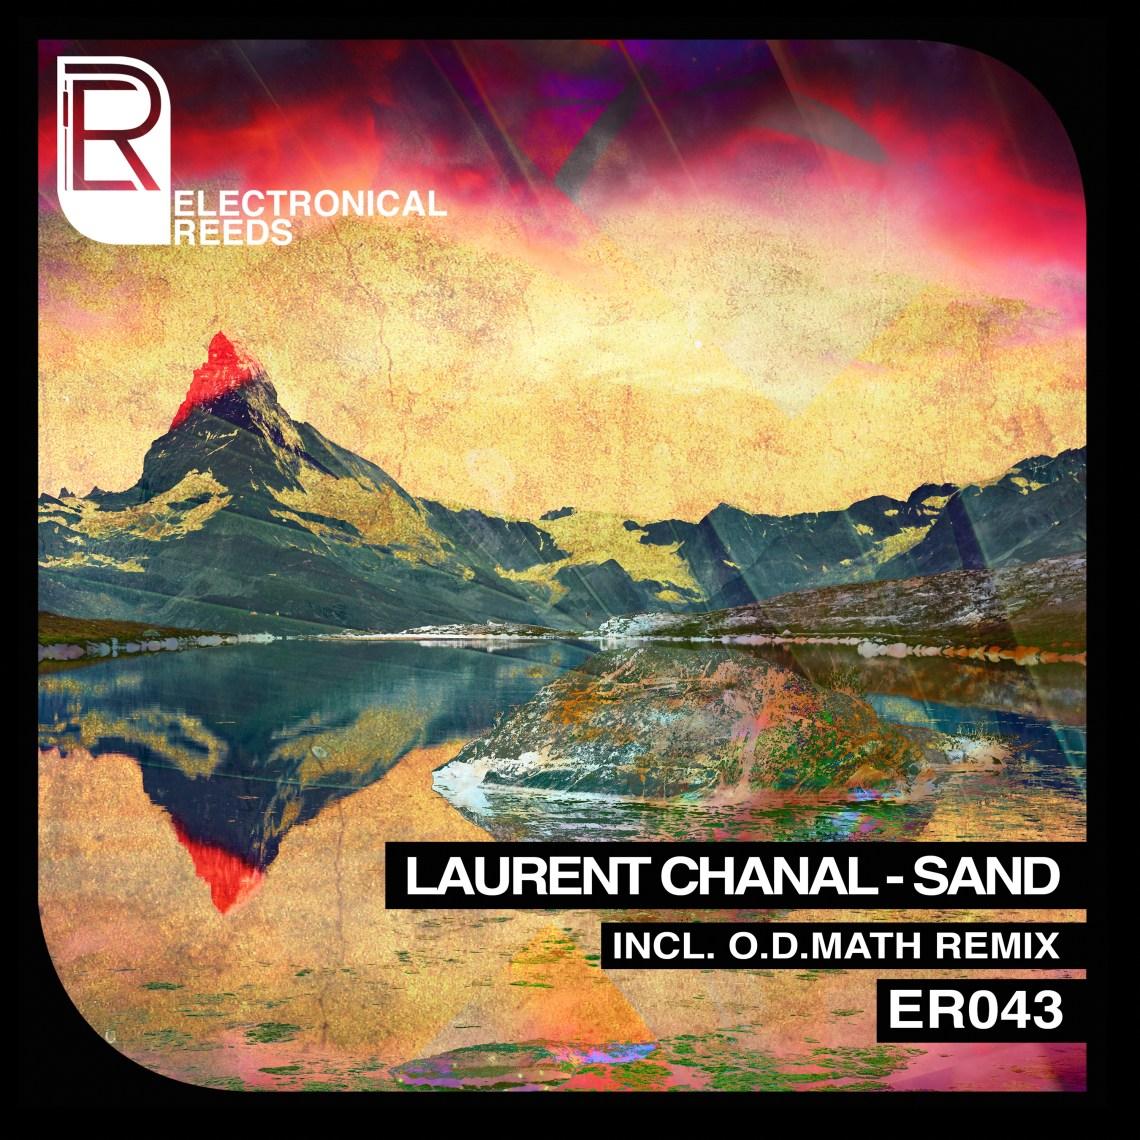 Laurent Chanal - Sand (incl. O.D.Math Remixes) - Electronical Reeds